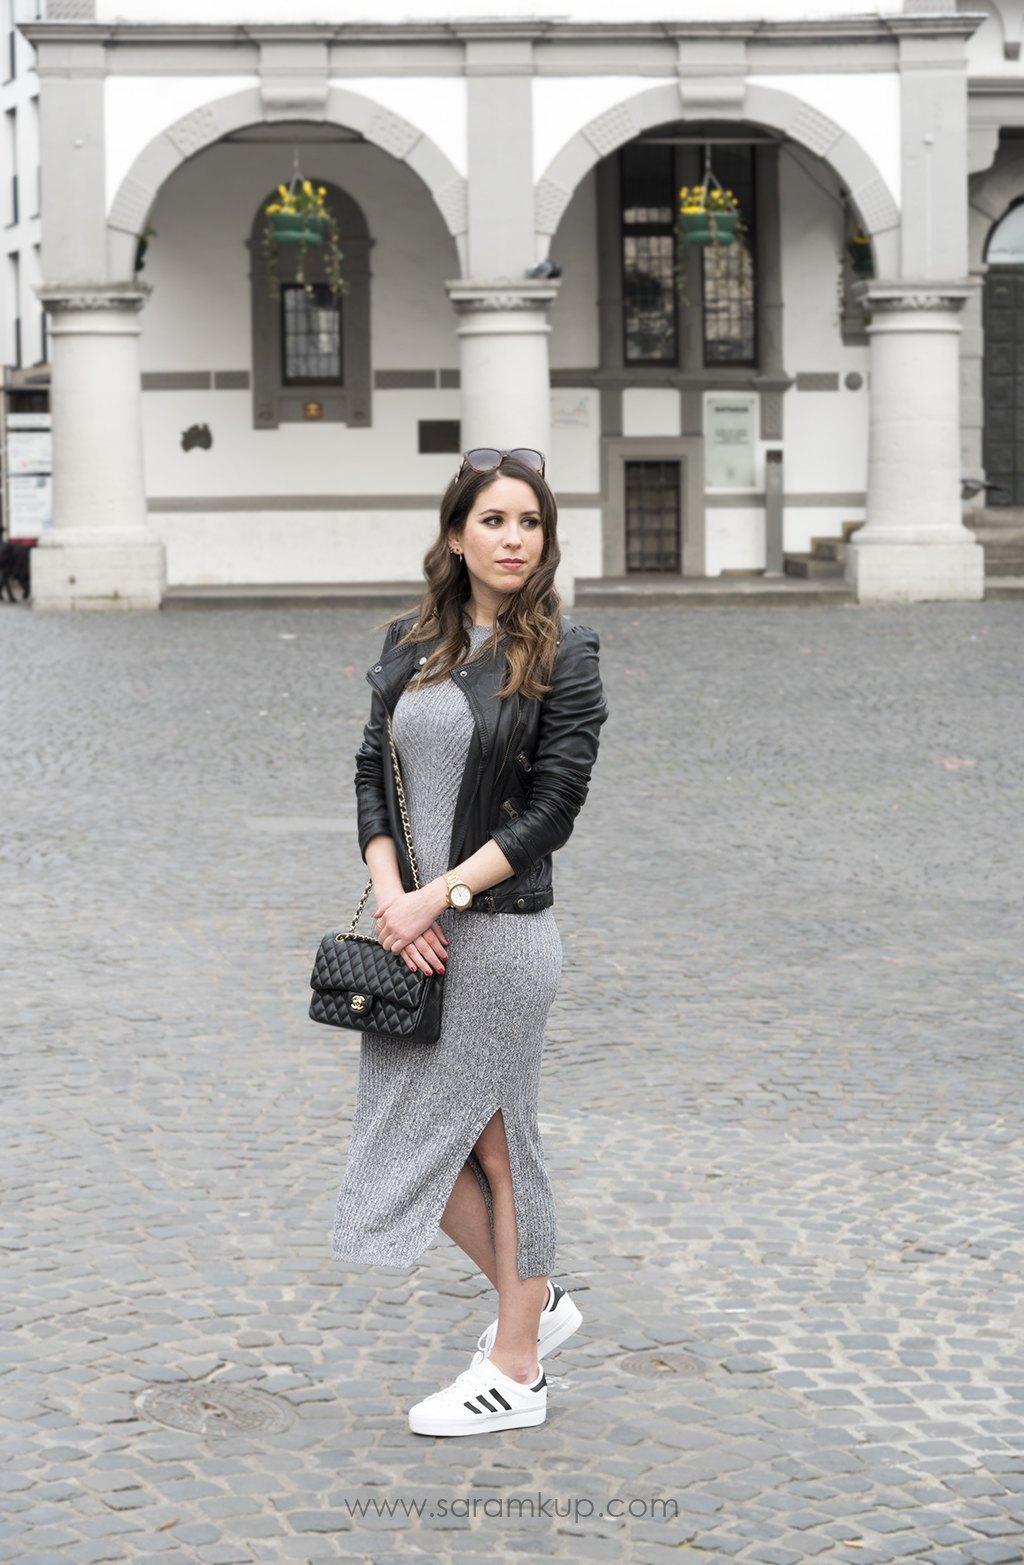 marikowskaya street style sara chanel bag (1)